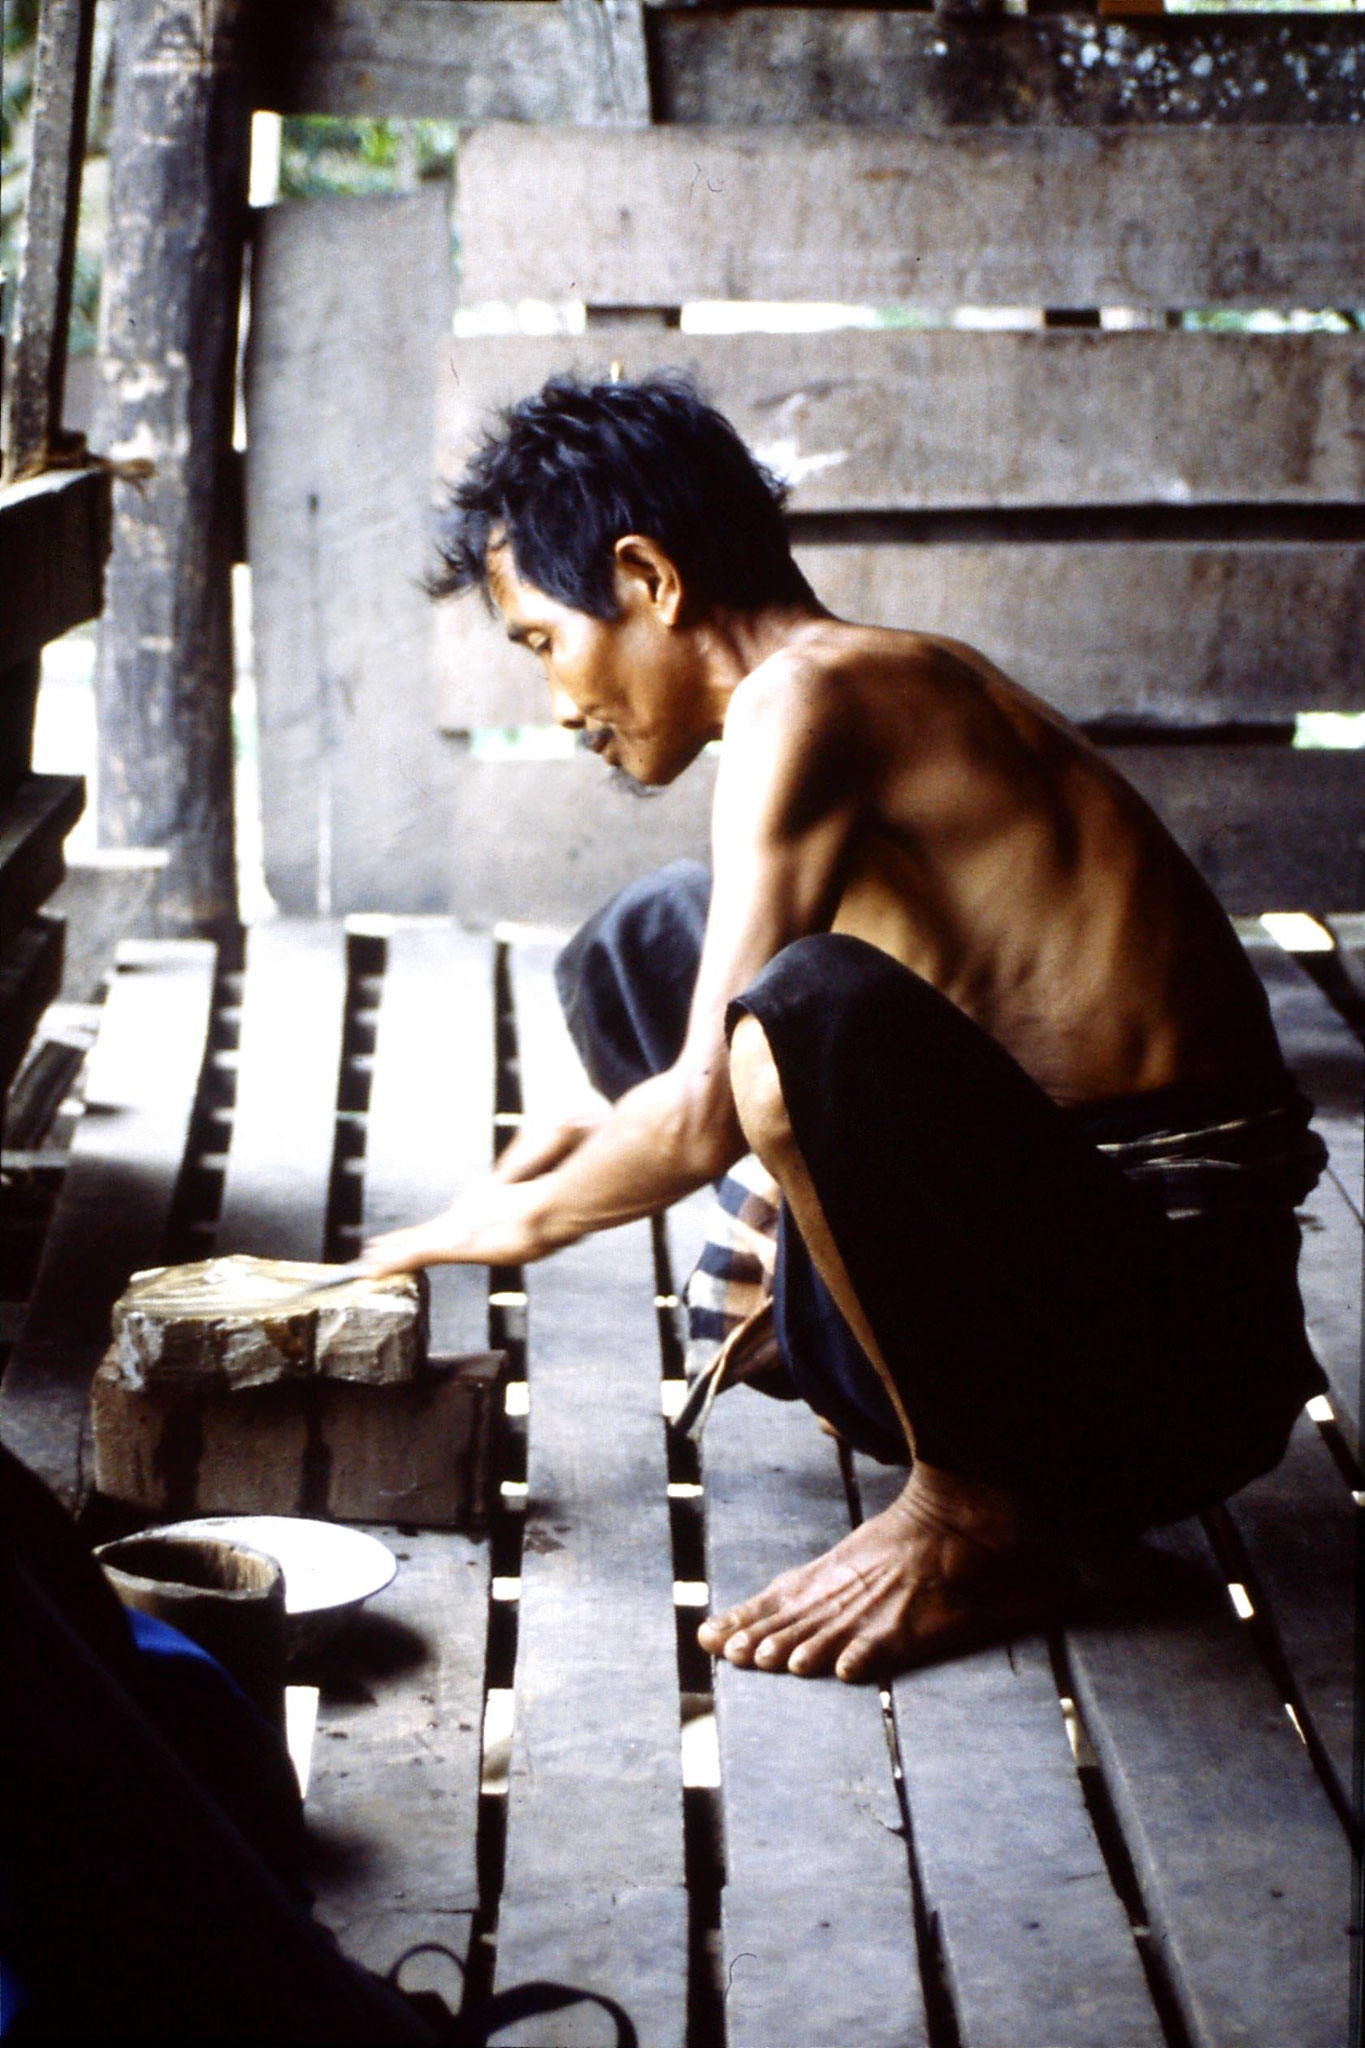 12/6/1990: 24: Trek - Hue Kom Karen village, sharpening knife